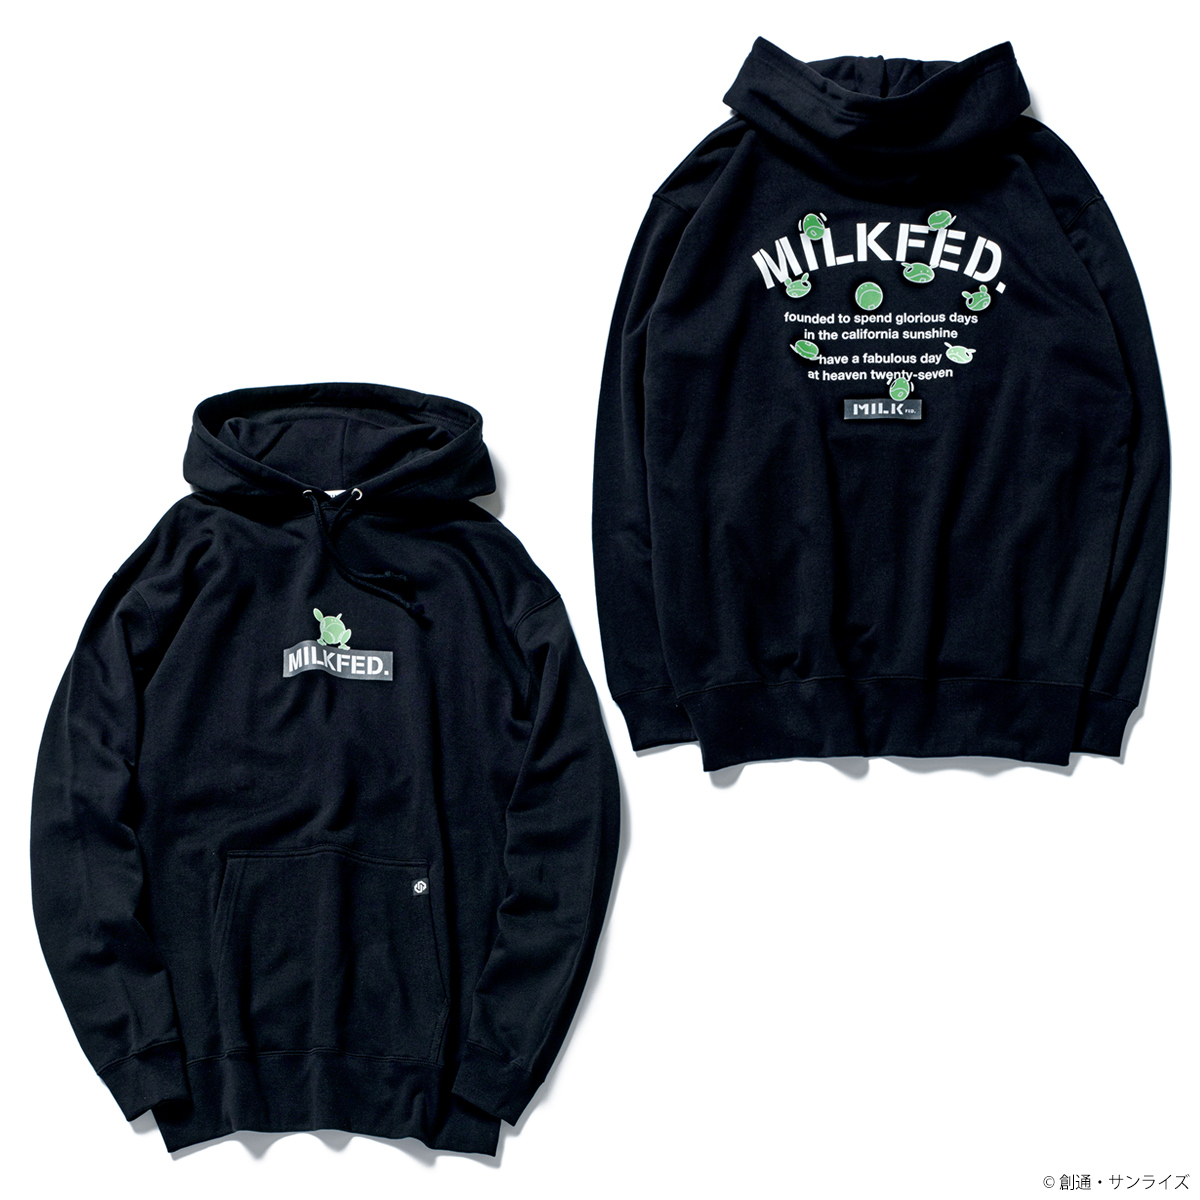 STRICT-G MILKFED.『機動戦士ガンダム』 パーカー ハロ バックロゴ